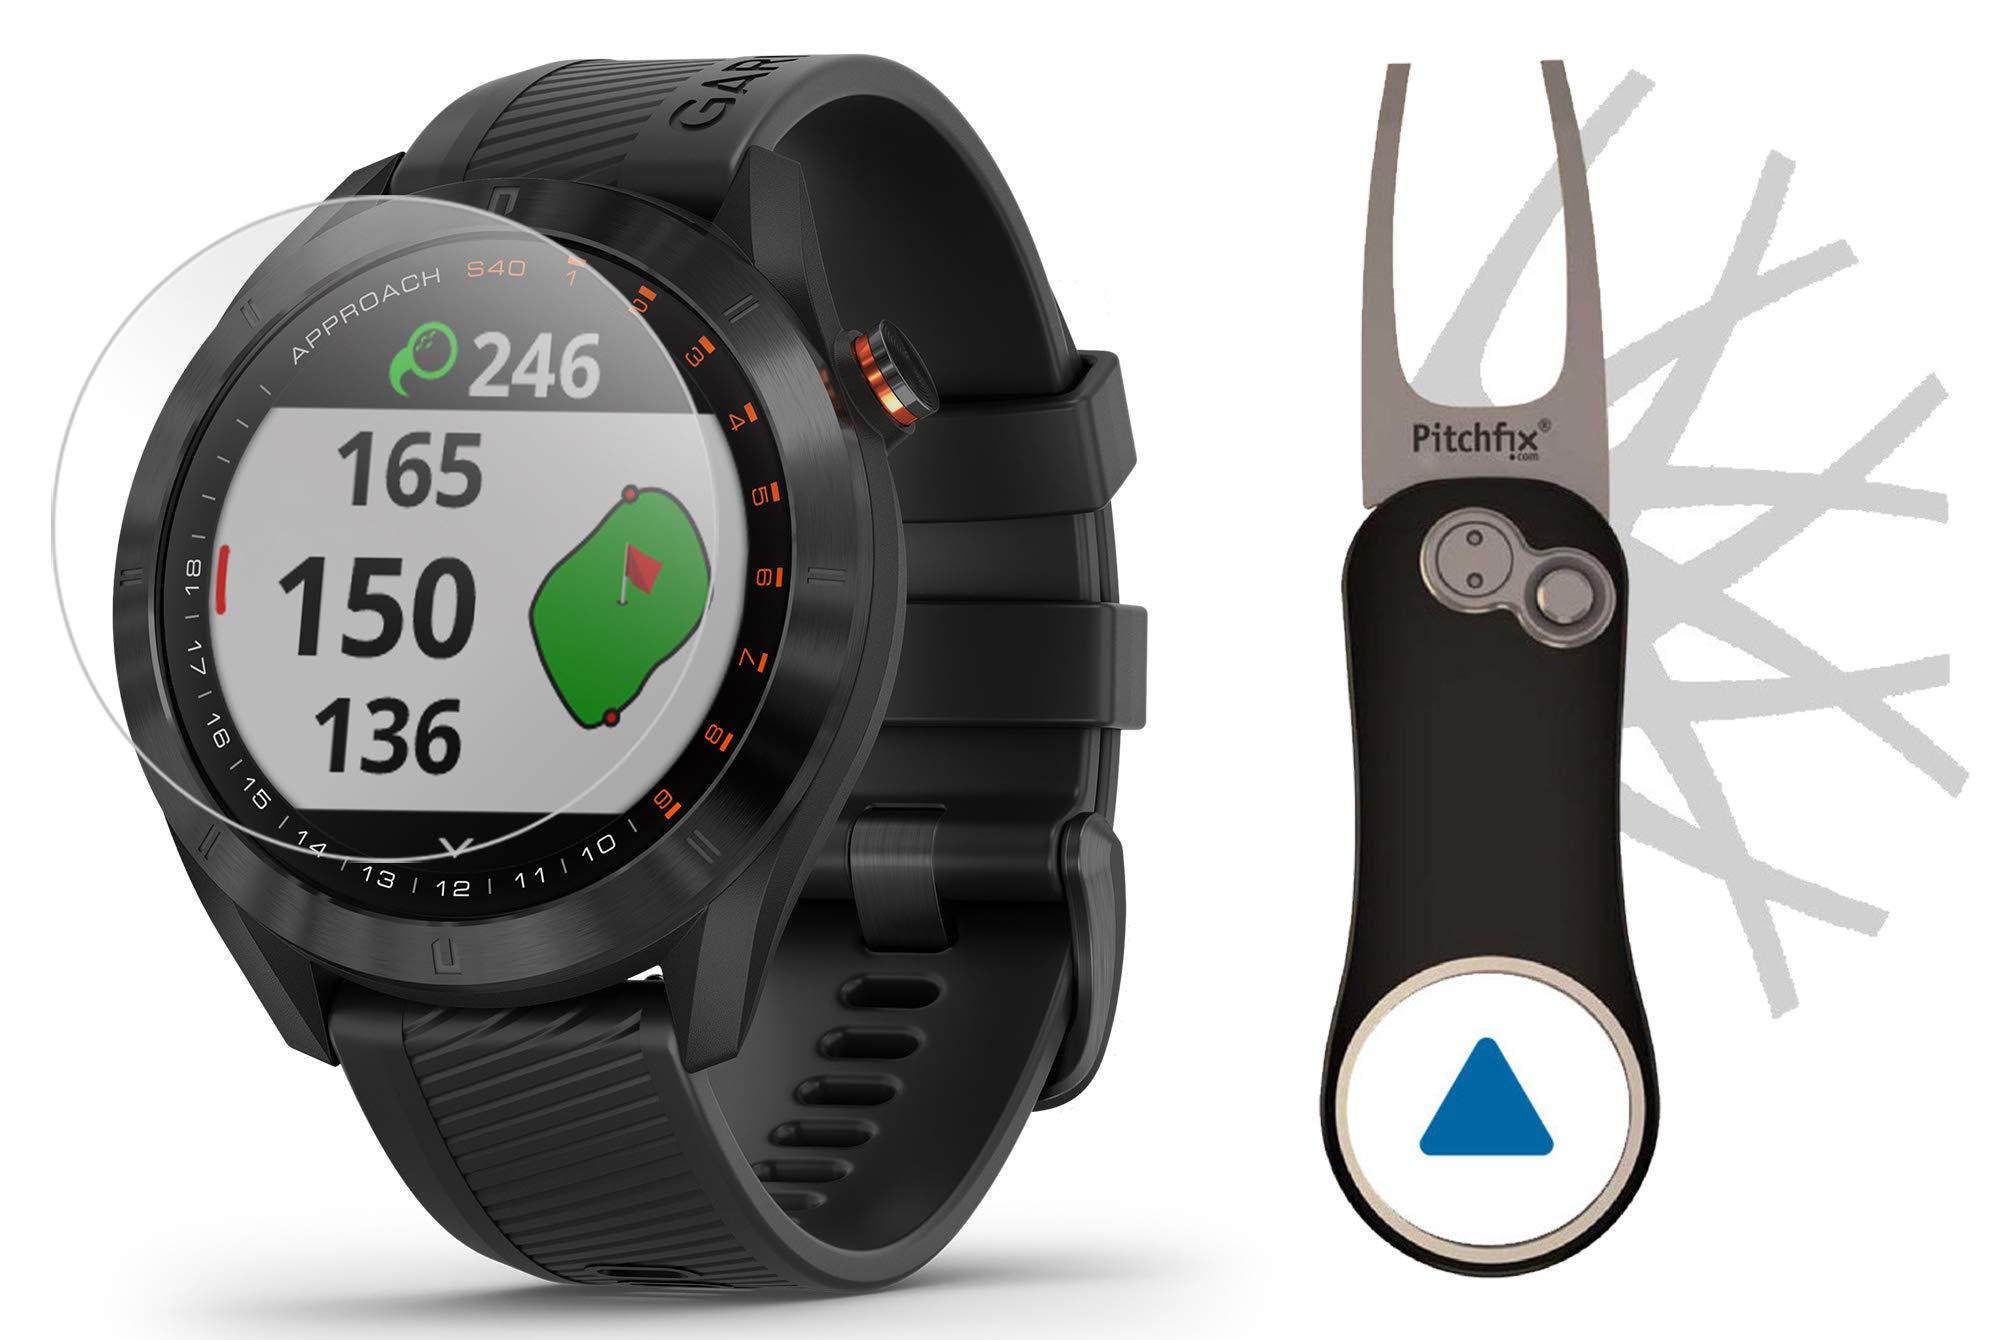 Garmin Approach S40 (Black) Golf GPS Smartwatch Bundle   Includes Garmin/PlayBetter Pitchfix Divot Tool & HD Screen Protectors   Stylish, Color Touchscreen, 41,000+ Courses   010-02140-01